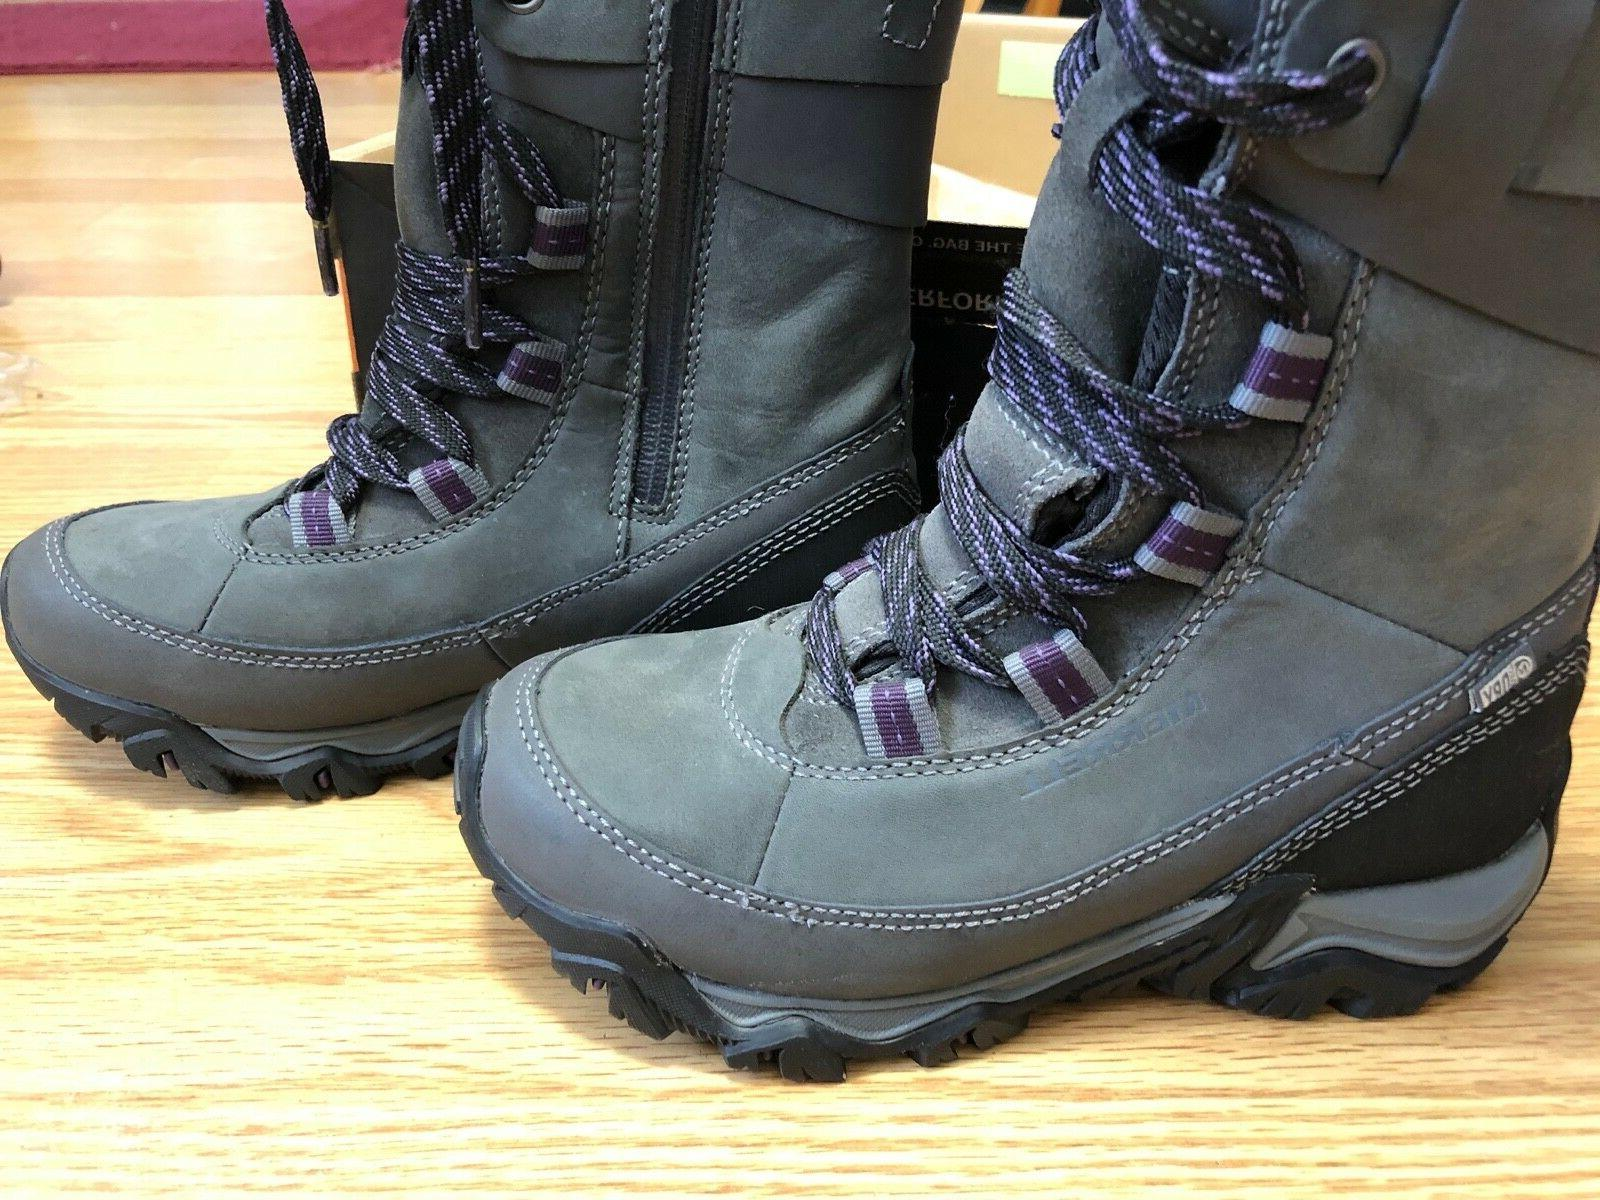 NIB Woman's Merrell Polarand Rove Boot